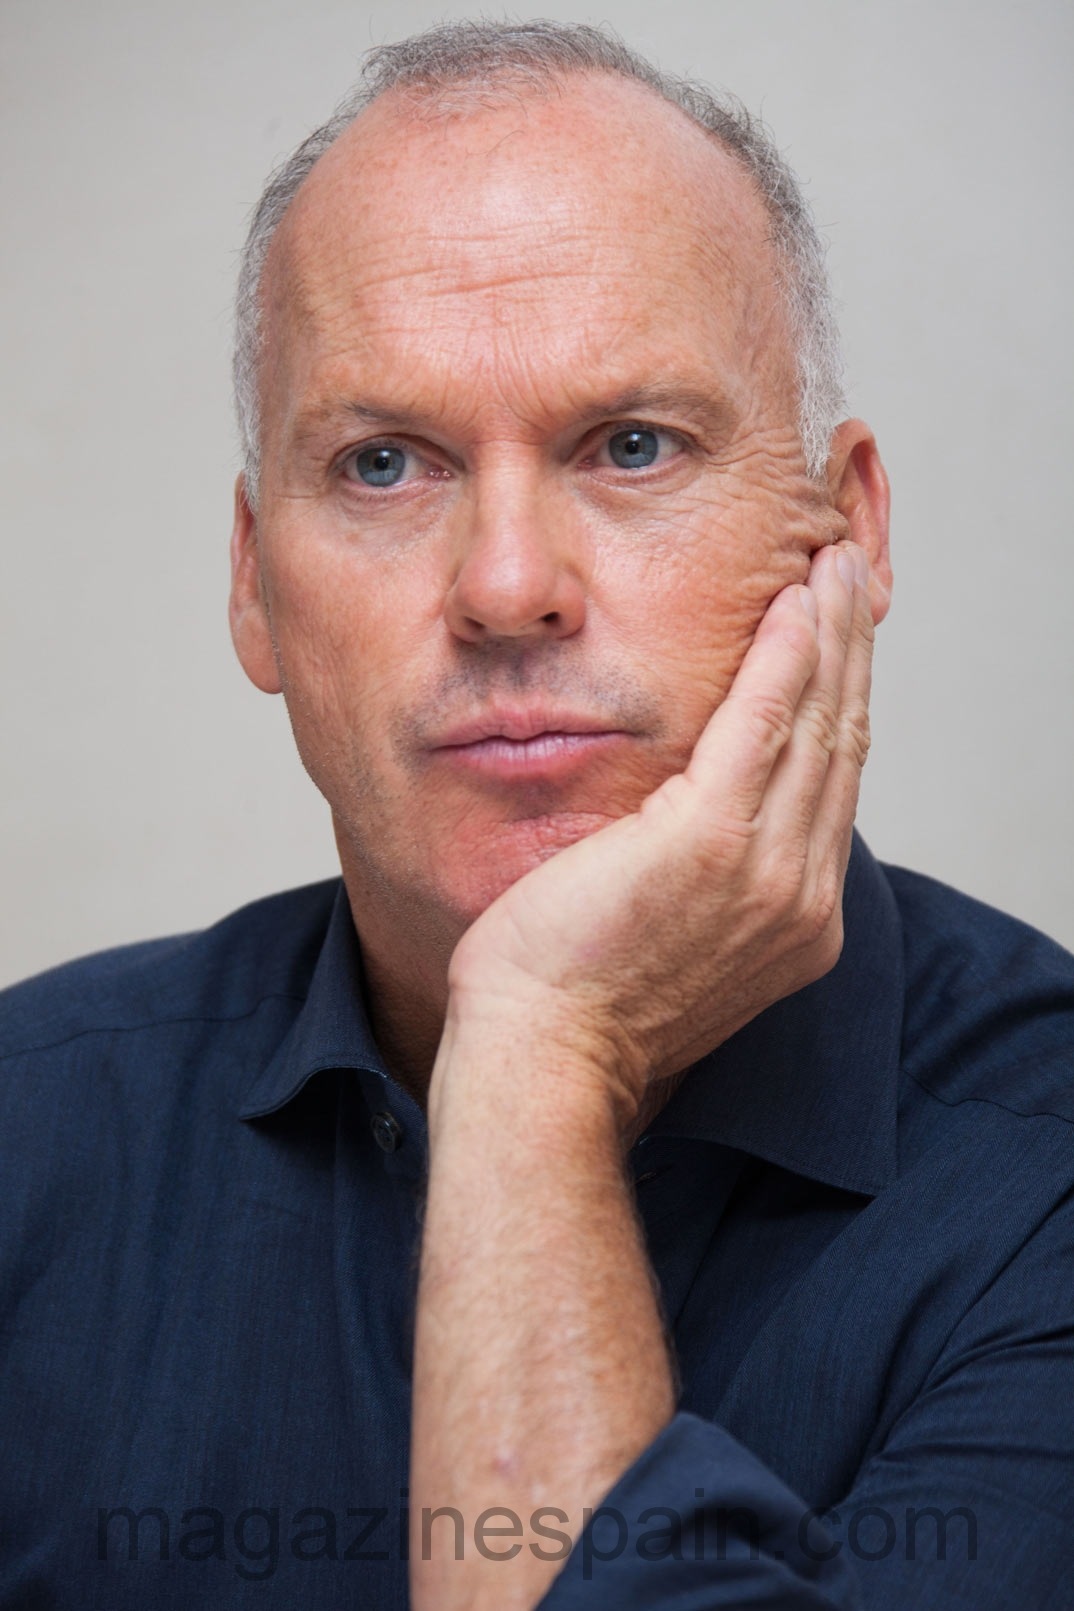 Michael-Keaton